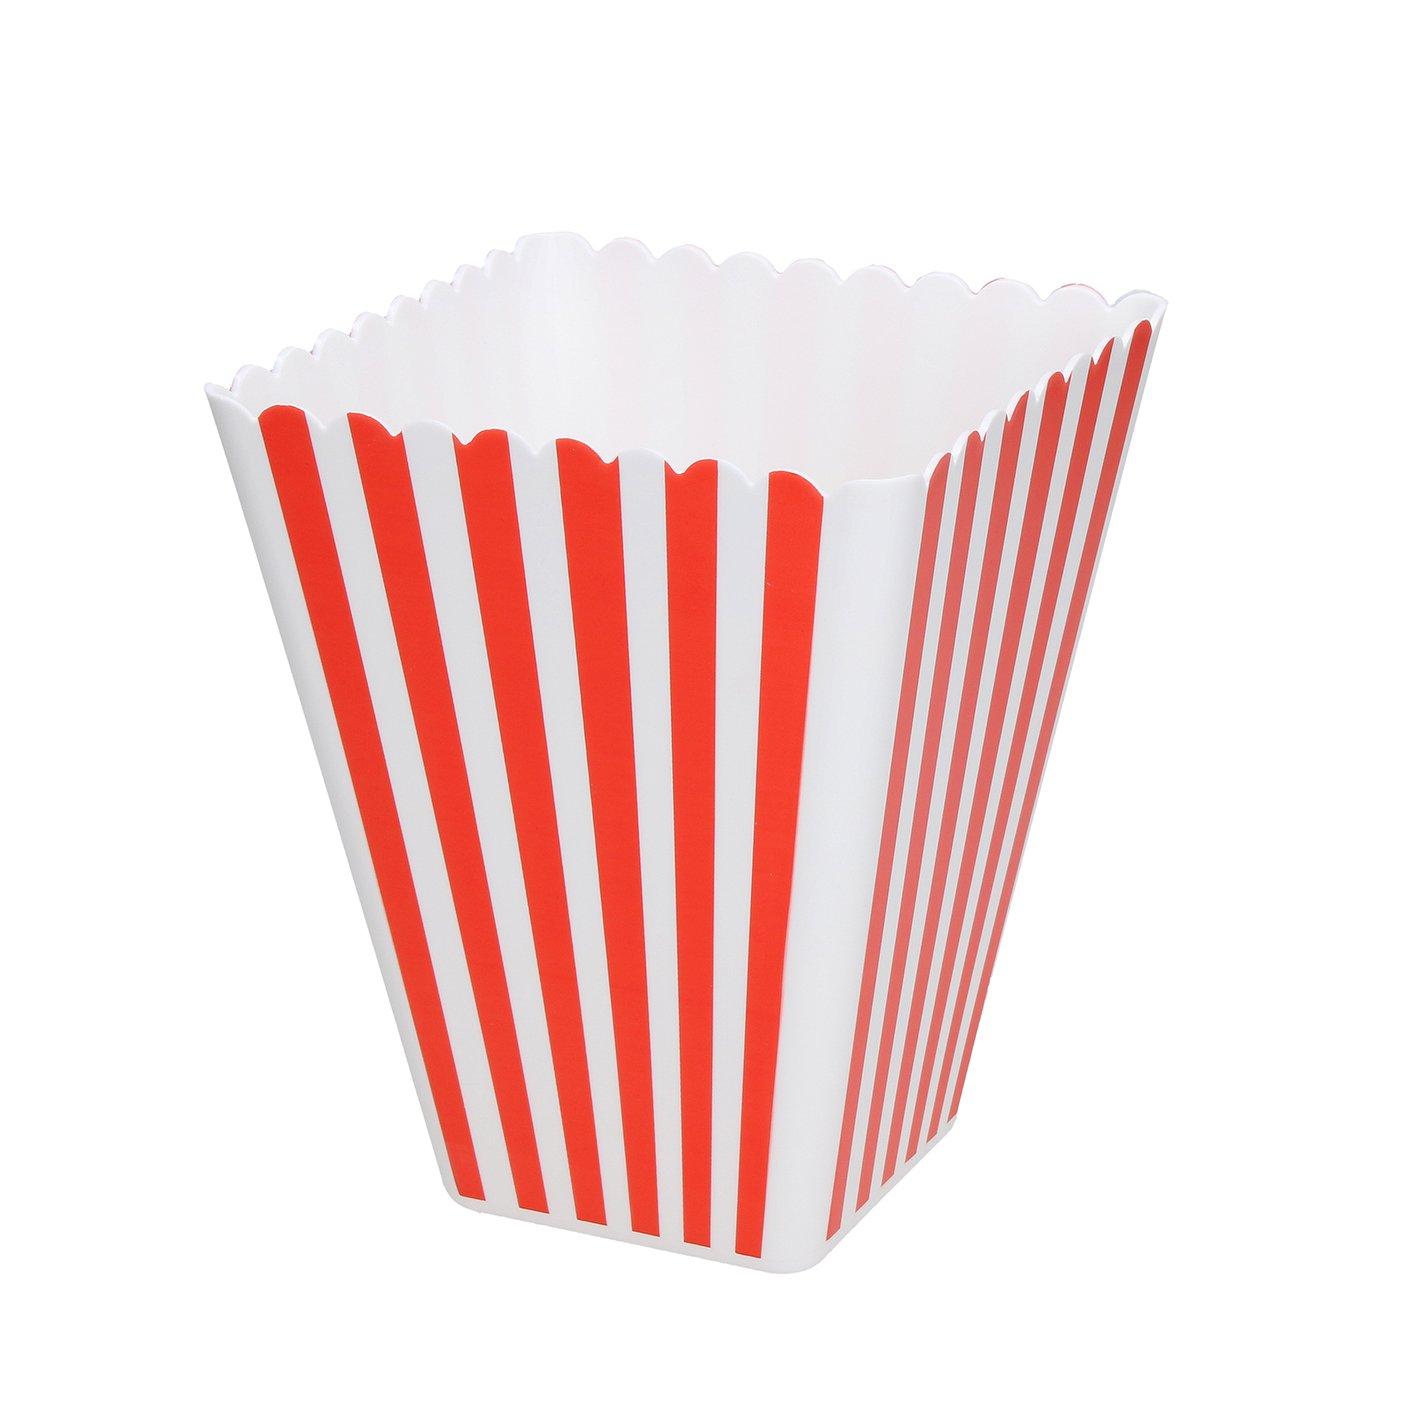 Al palomitas popcorn Carcasa rígida